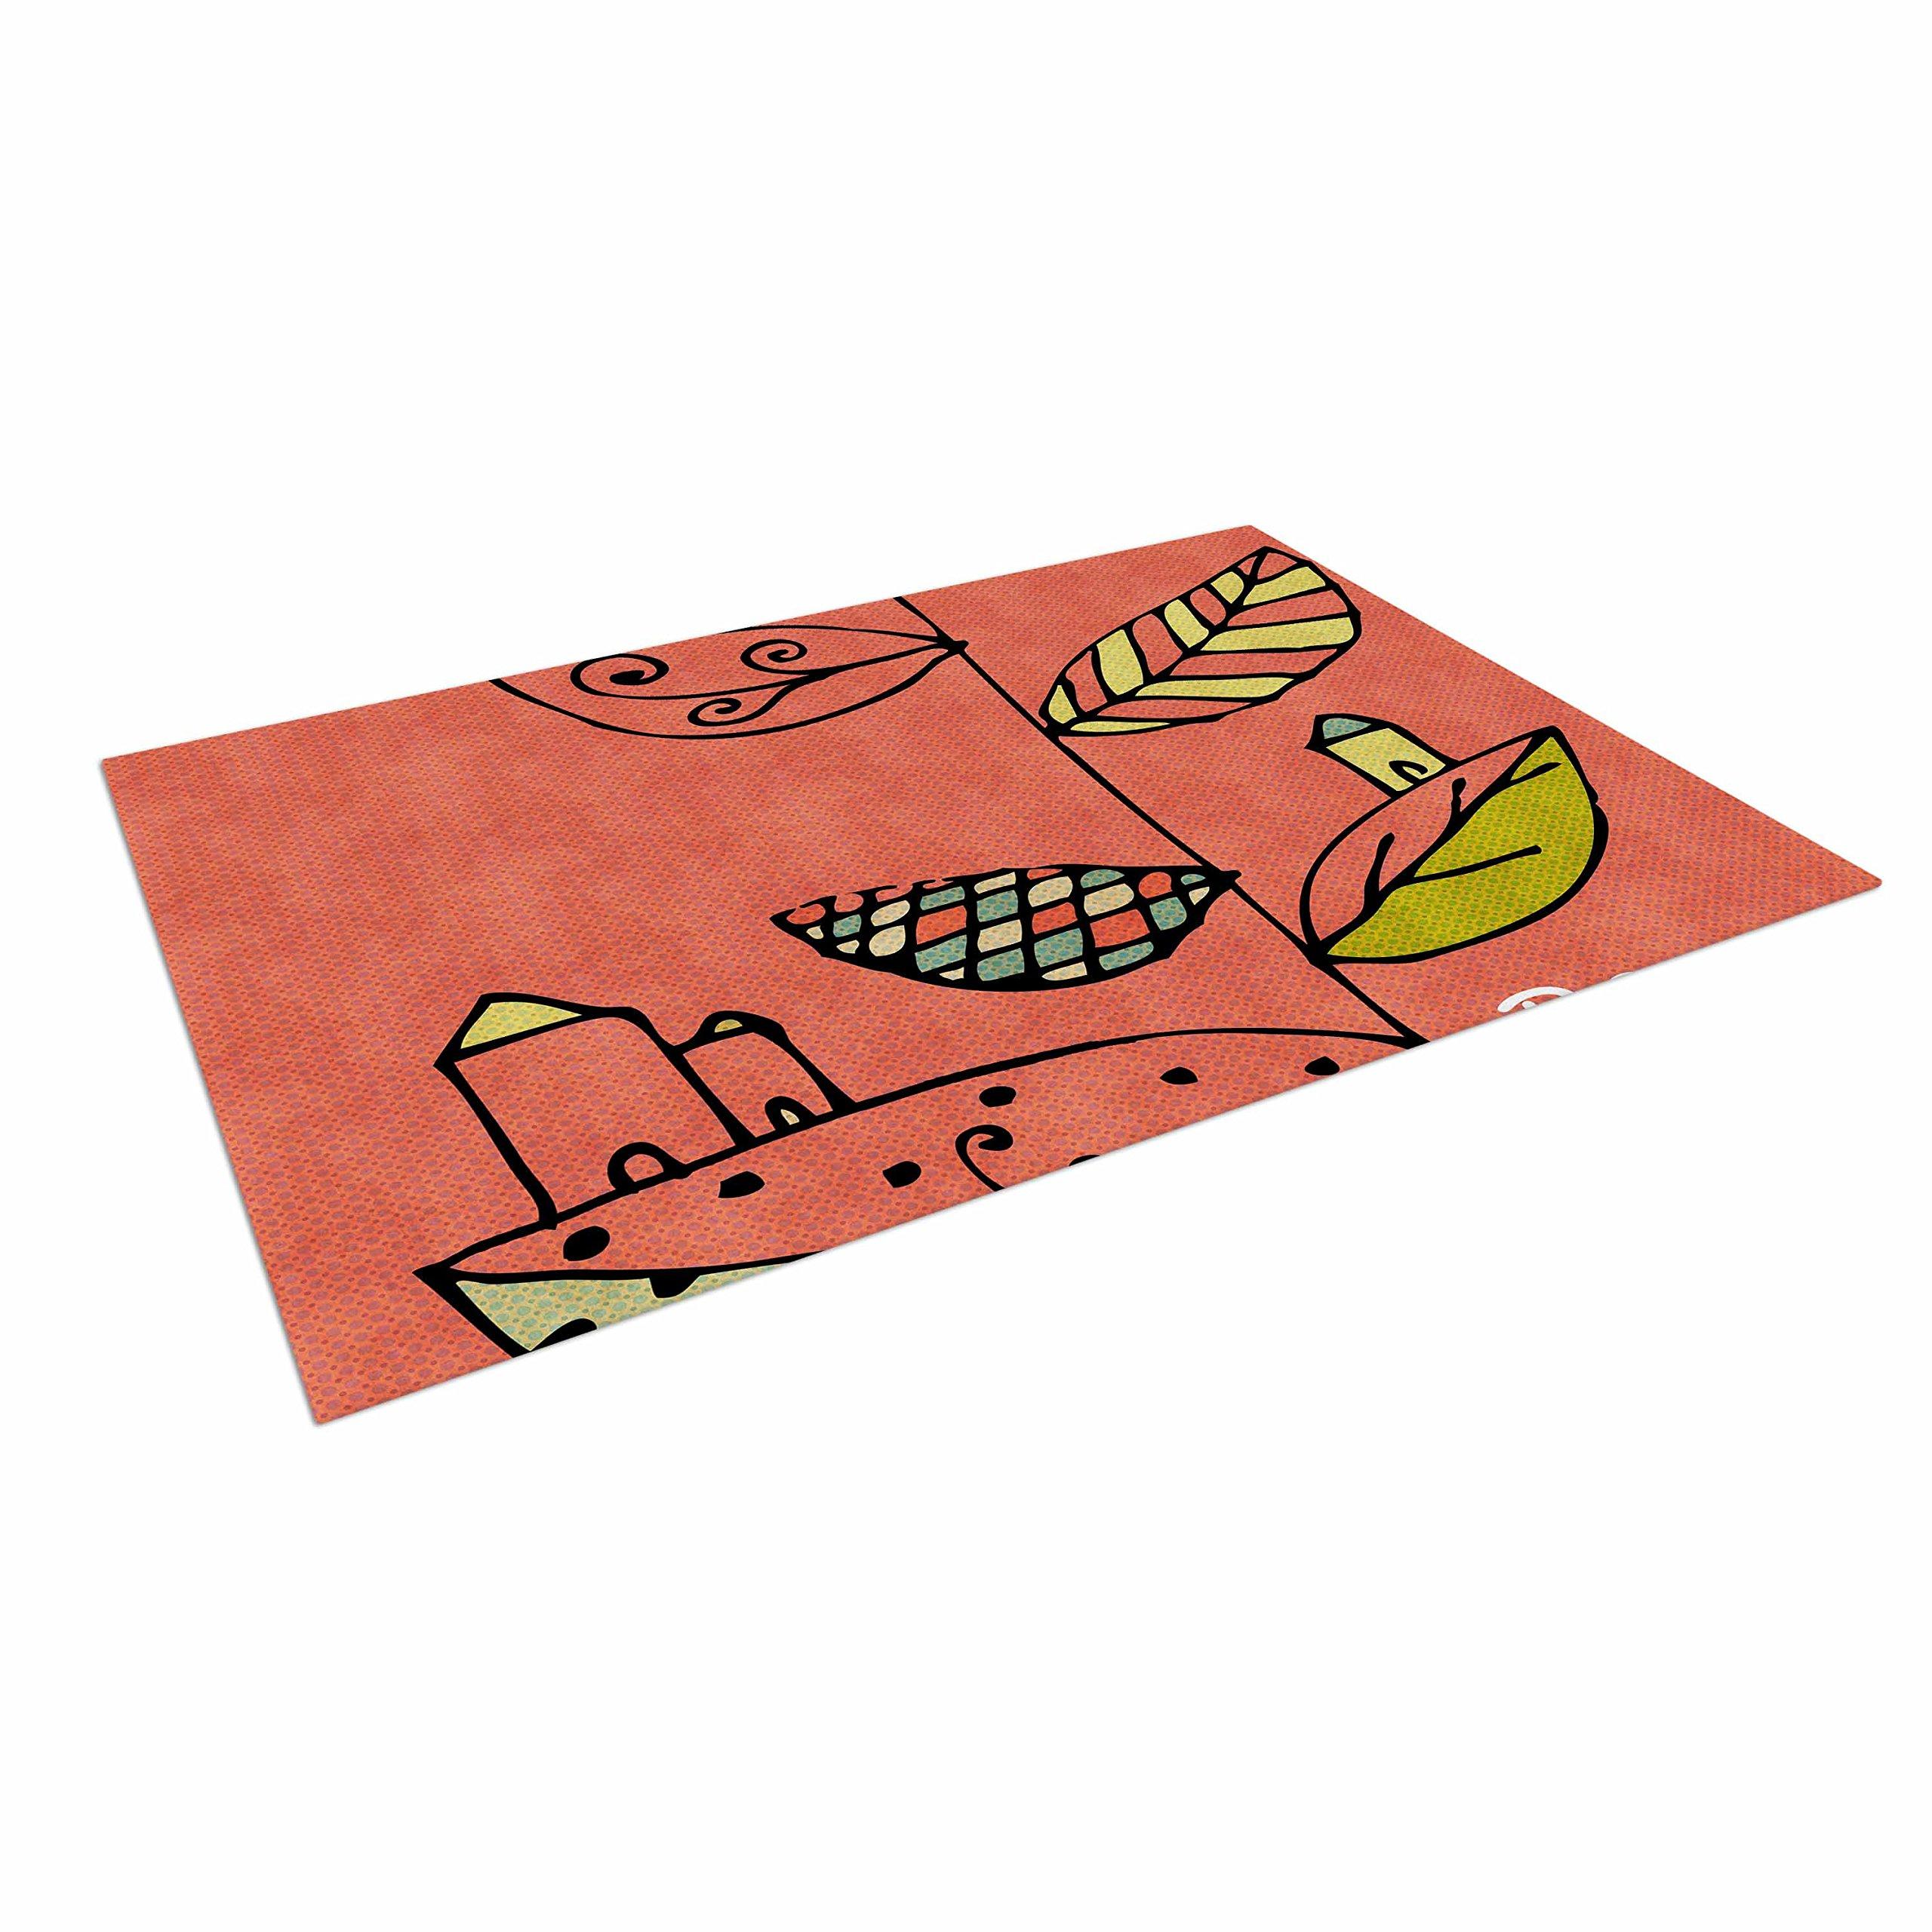 KESS InHouse Carina Povarchik ''Be You'' Coral Kids Outdoor Floor Mat, 4' x 5'